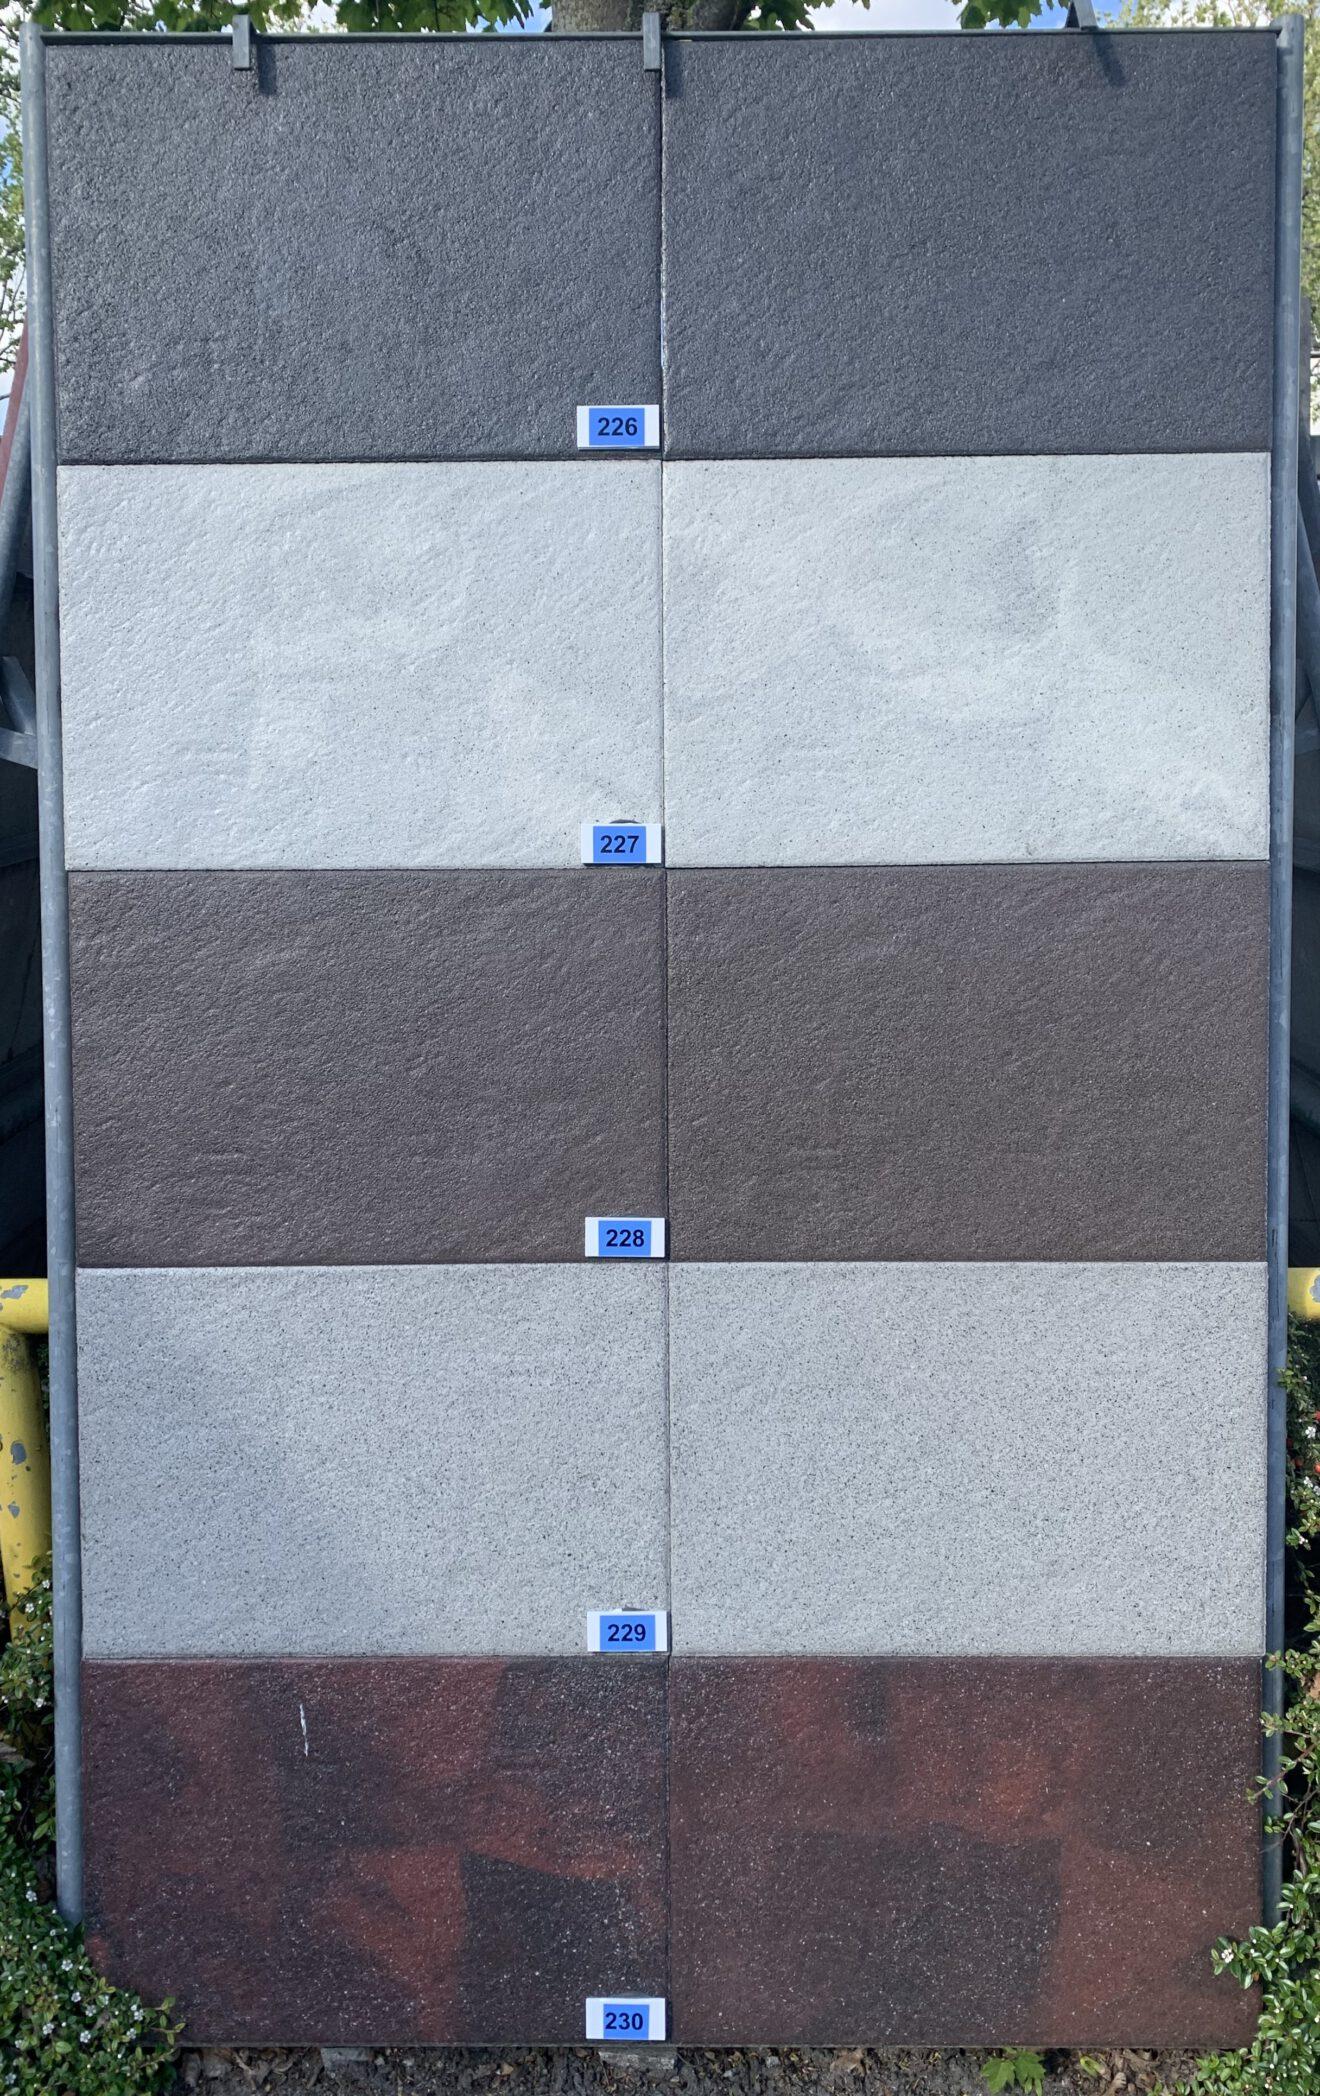 Gartenplatte Novaclean Phoenix bei Stolzenbach Baustoffe in Bremen kaufen